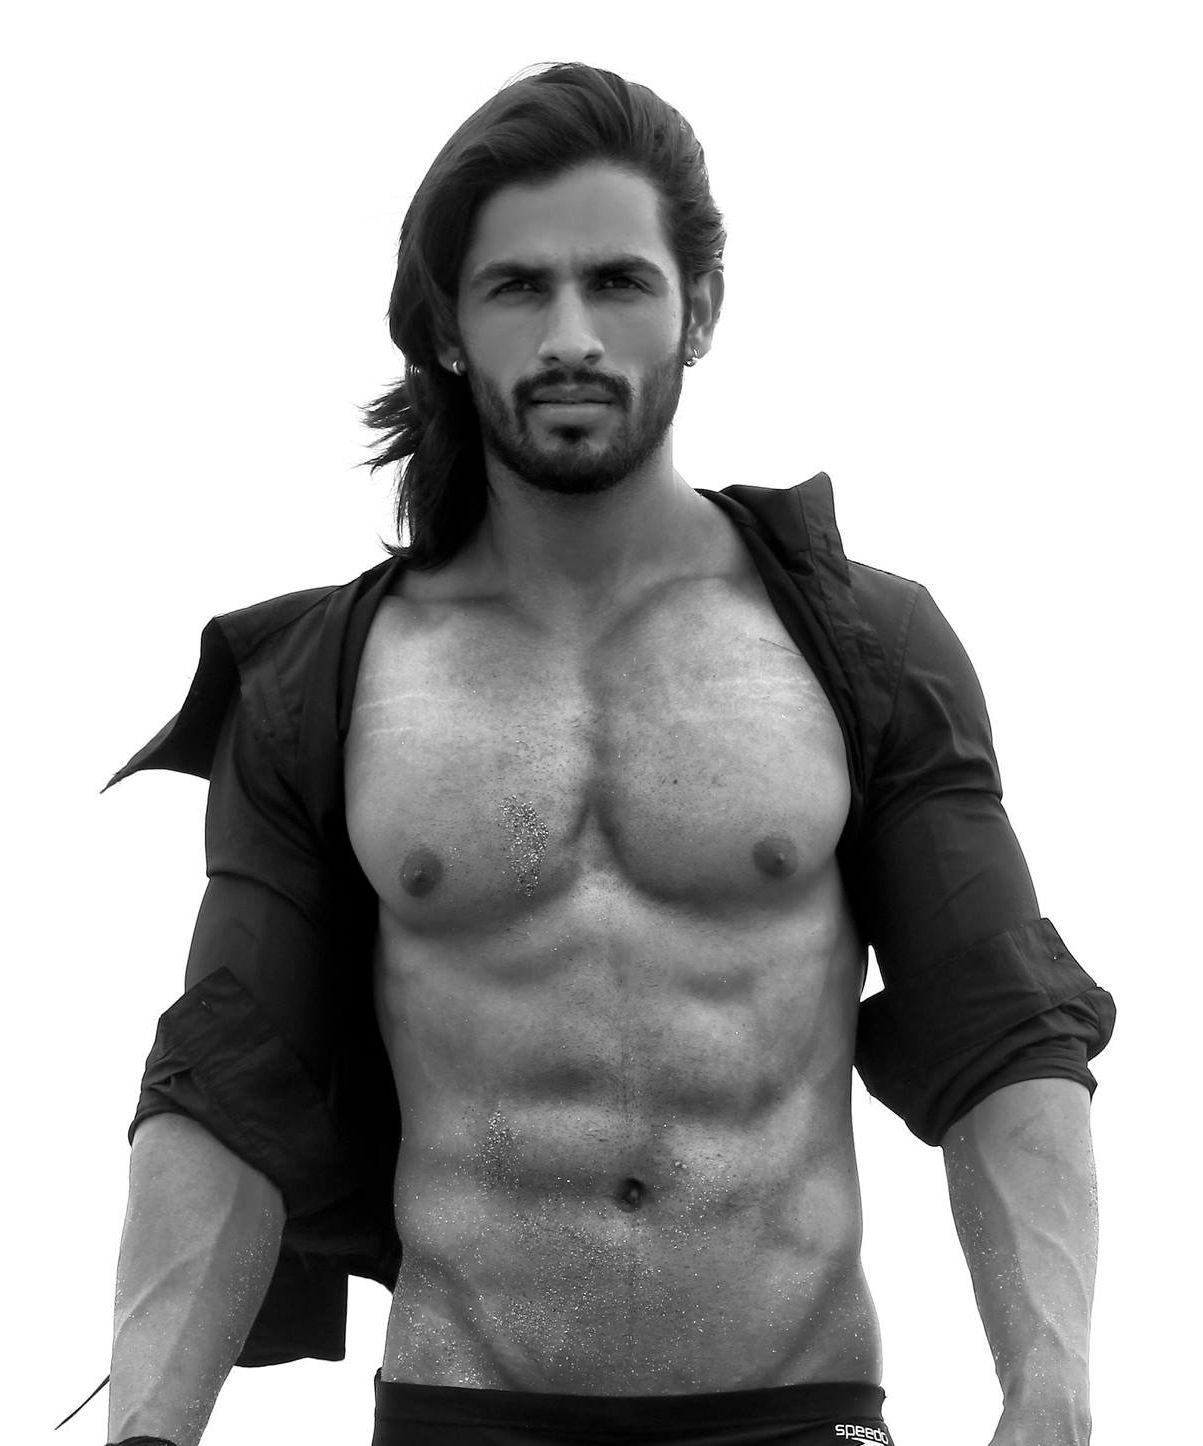 Sexy indian guys tumblr